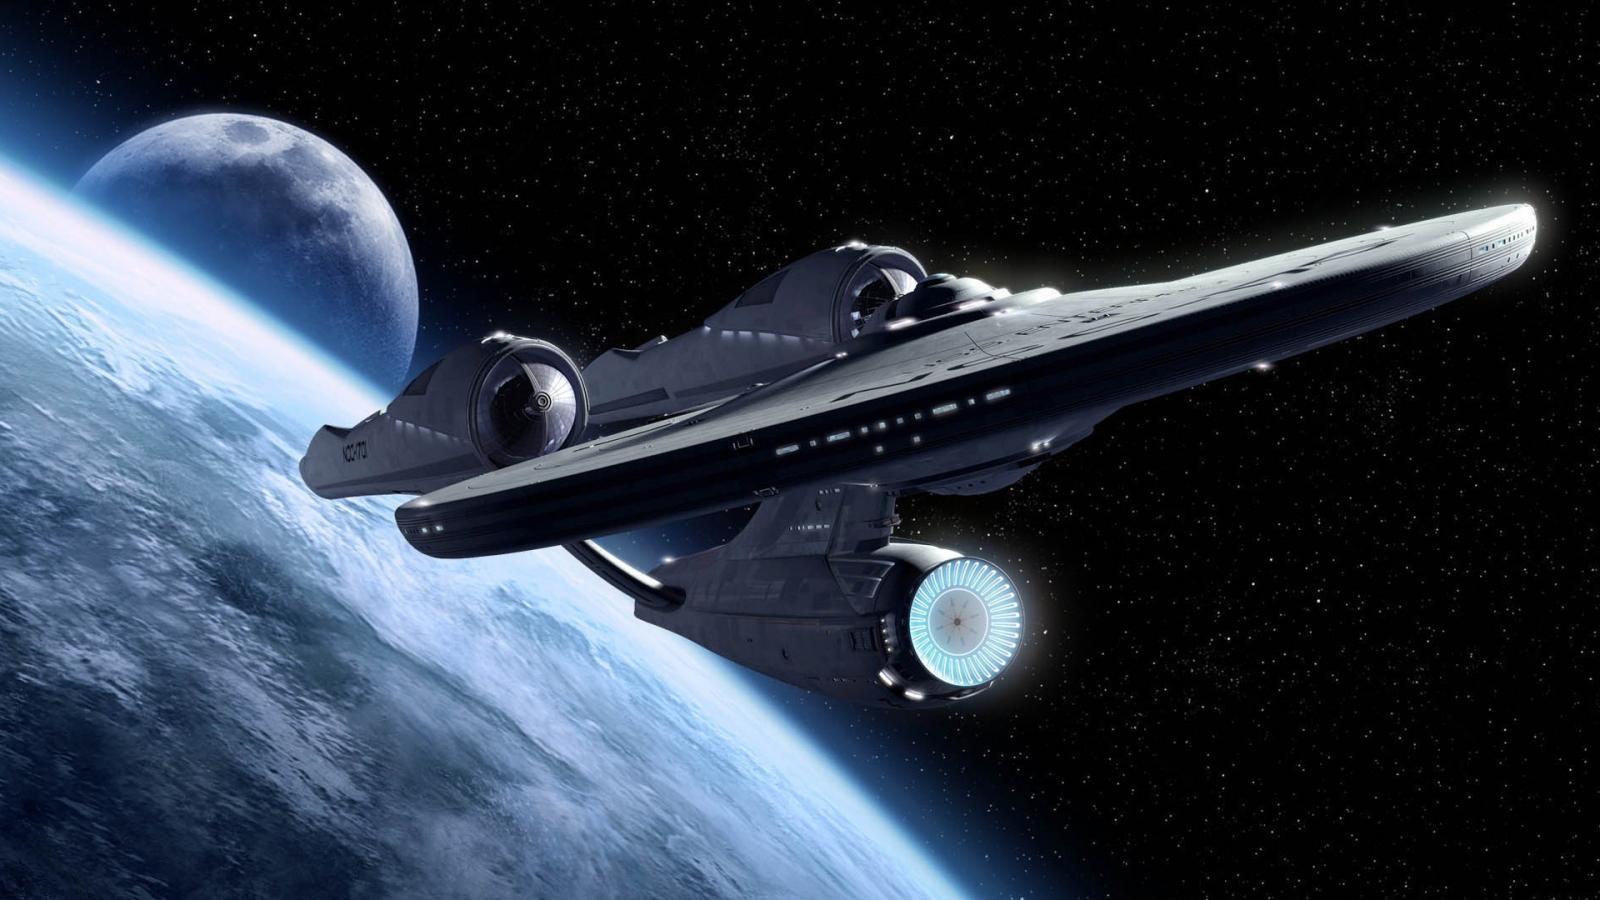 Star Trek Enterprise uses warp drive